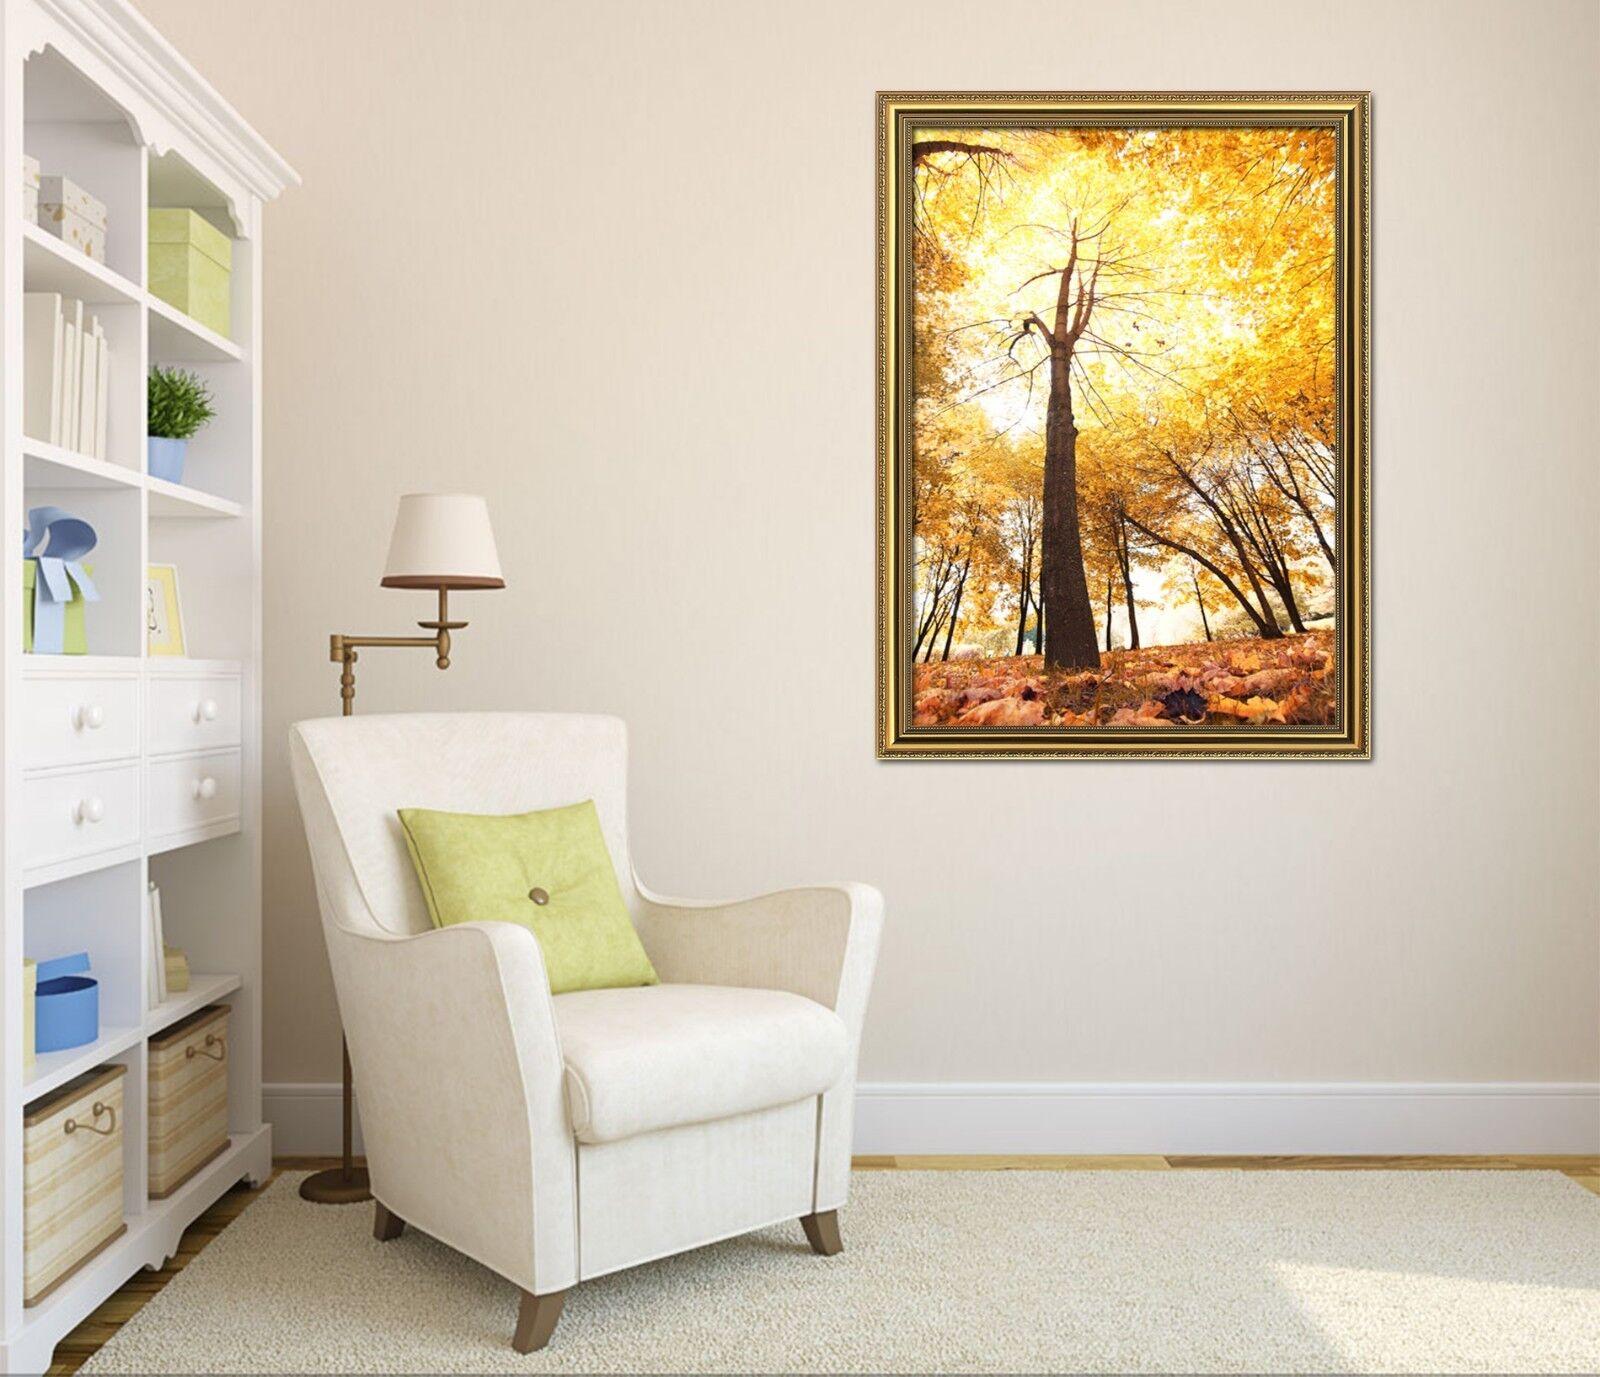 3D golden Tree 685 Fake Framed Poster Home Decor Print Painting Unique Art